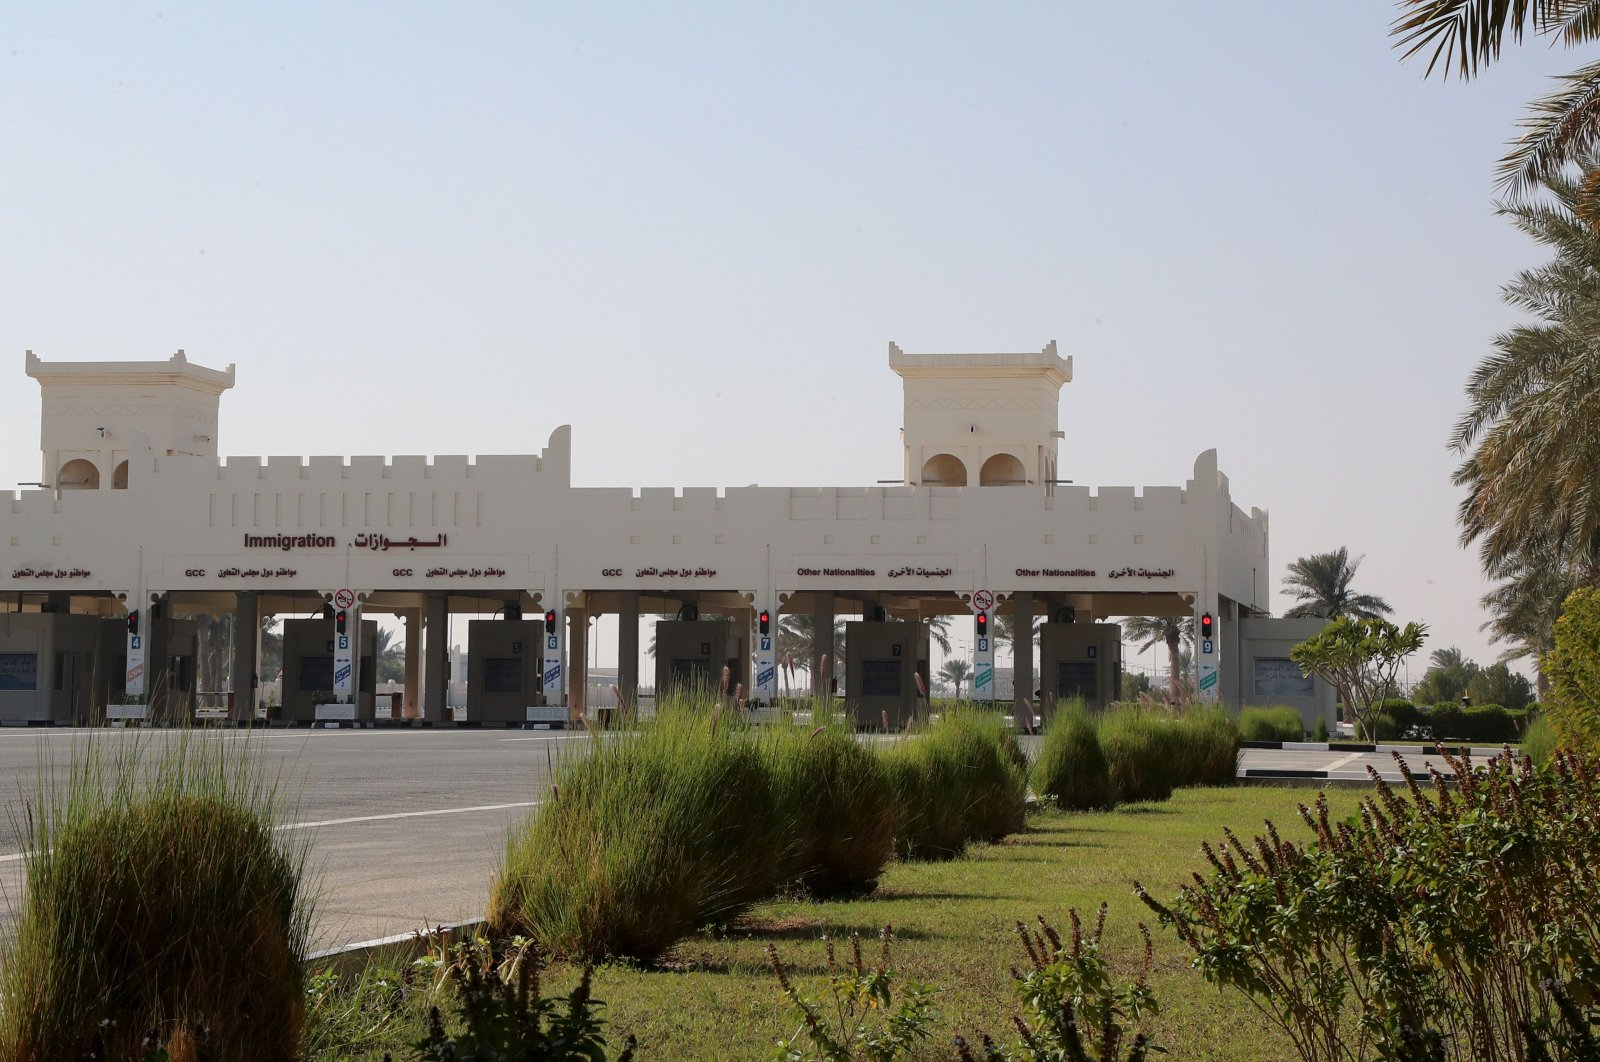 The Qatari side of the Abu Samrah border crossing with Saudi Arabia, Jan. 7, 2021. (AFP Photo)